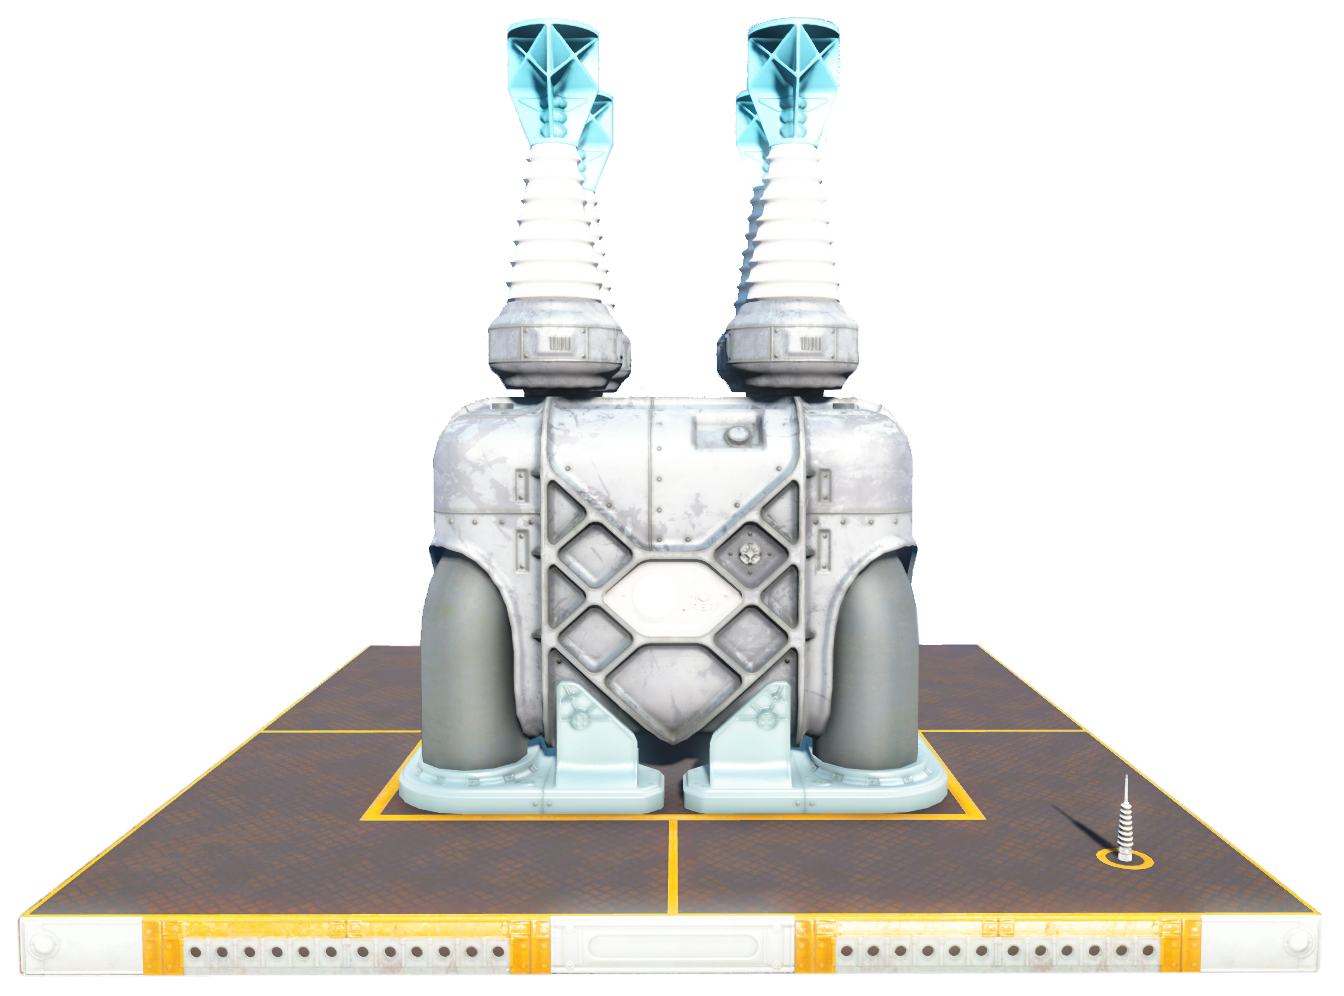 Generator Fallout 4 Wiki Fandom Powered By Wikia Wiring Vault 88 Fo4vw Tec Reactor